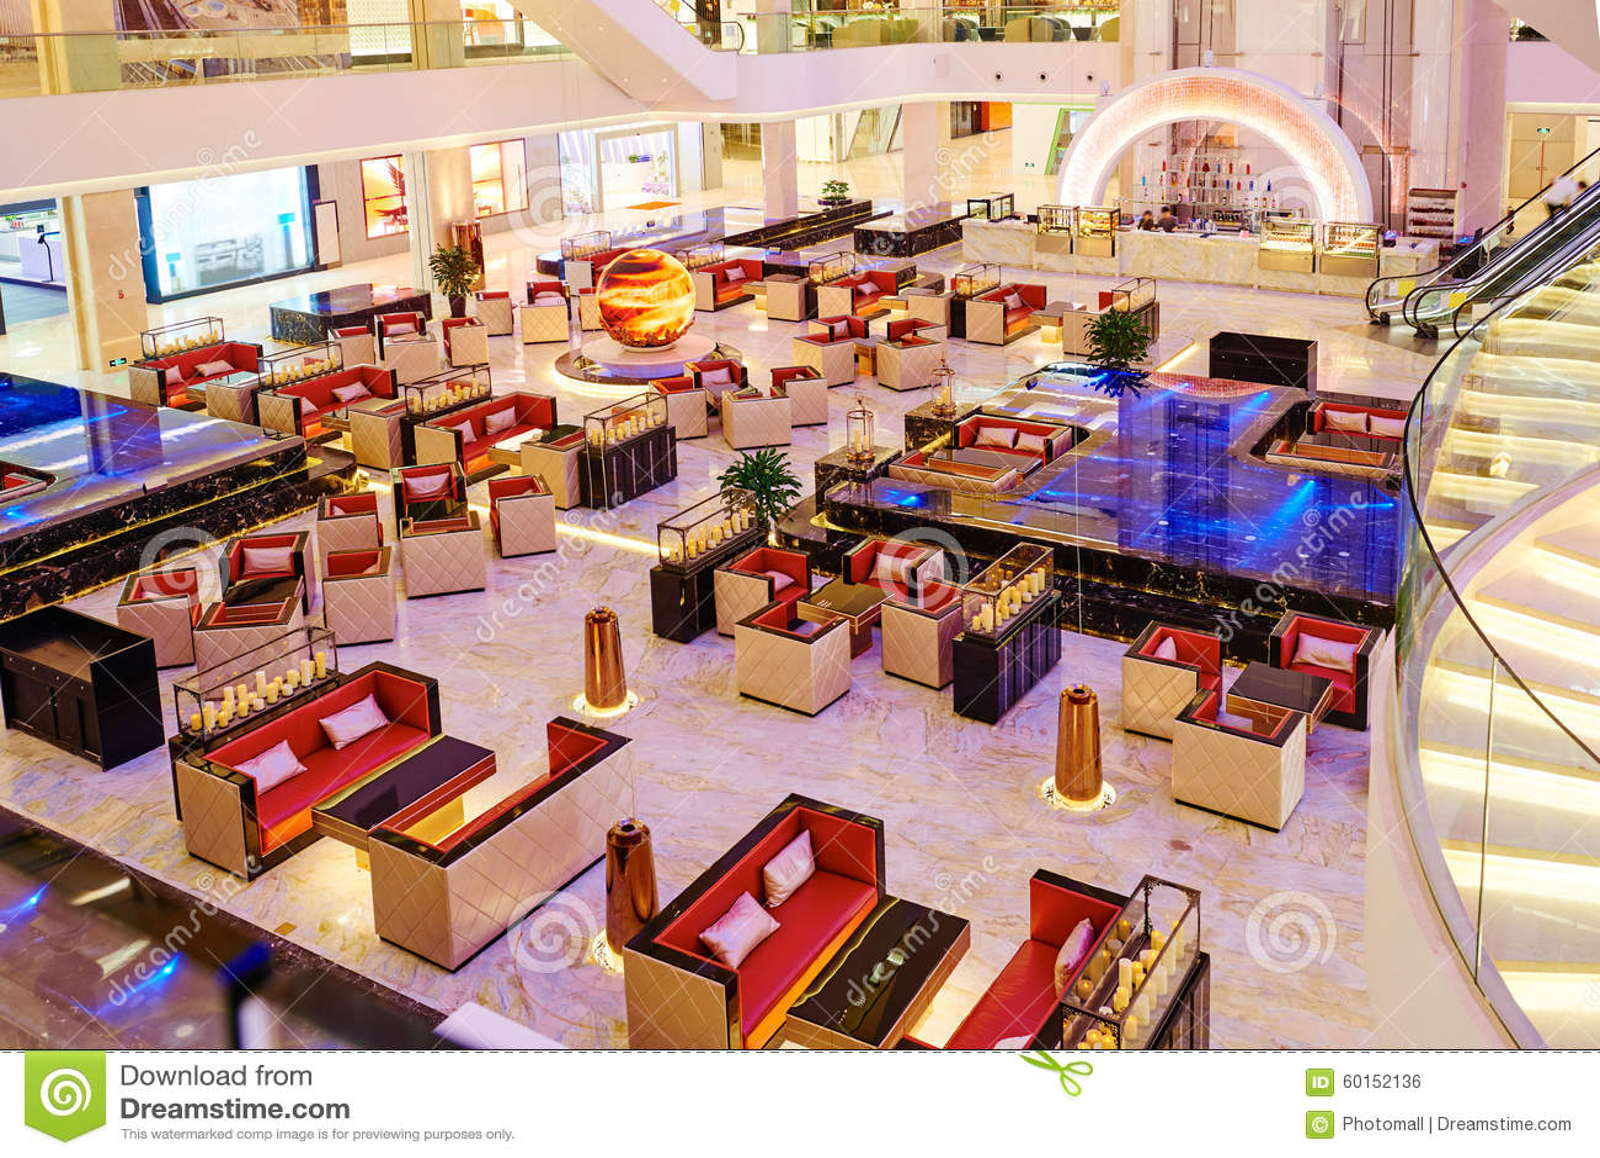 Restaurant Hall In The Hotel Stock Photo CartoonDealer  : luxury coffee shop modern hotel hall illuminated led light 60152136 from cartoondealer.com size 1300 x 958 jpeg 274kB